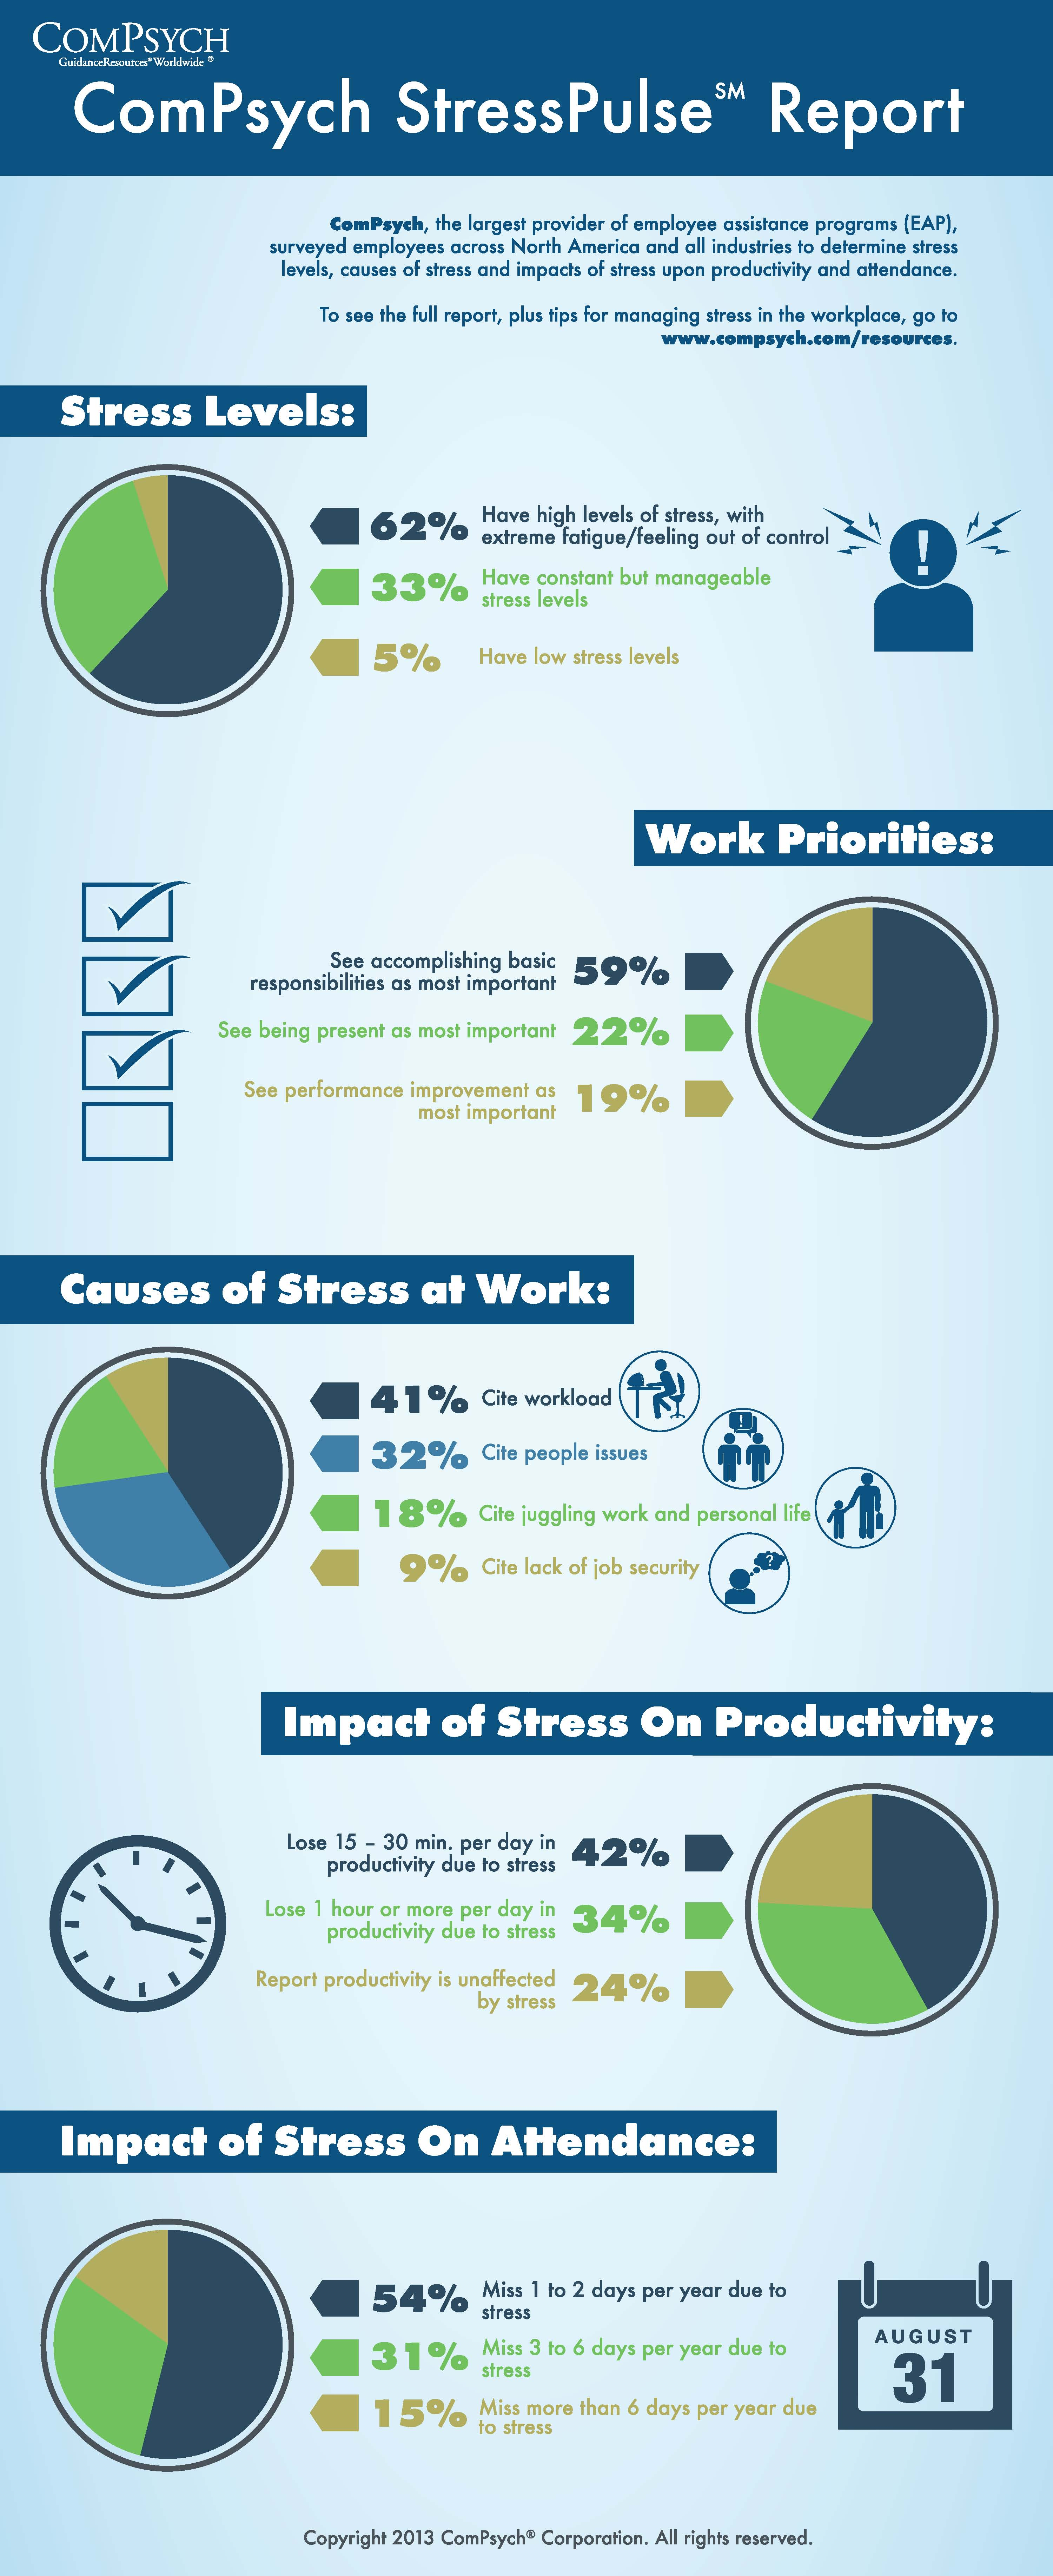 compsych-stresspulse-survey_52657fa8437f4